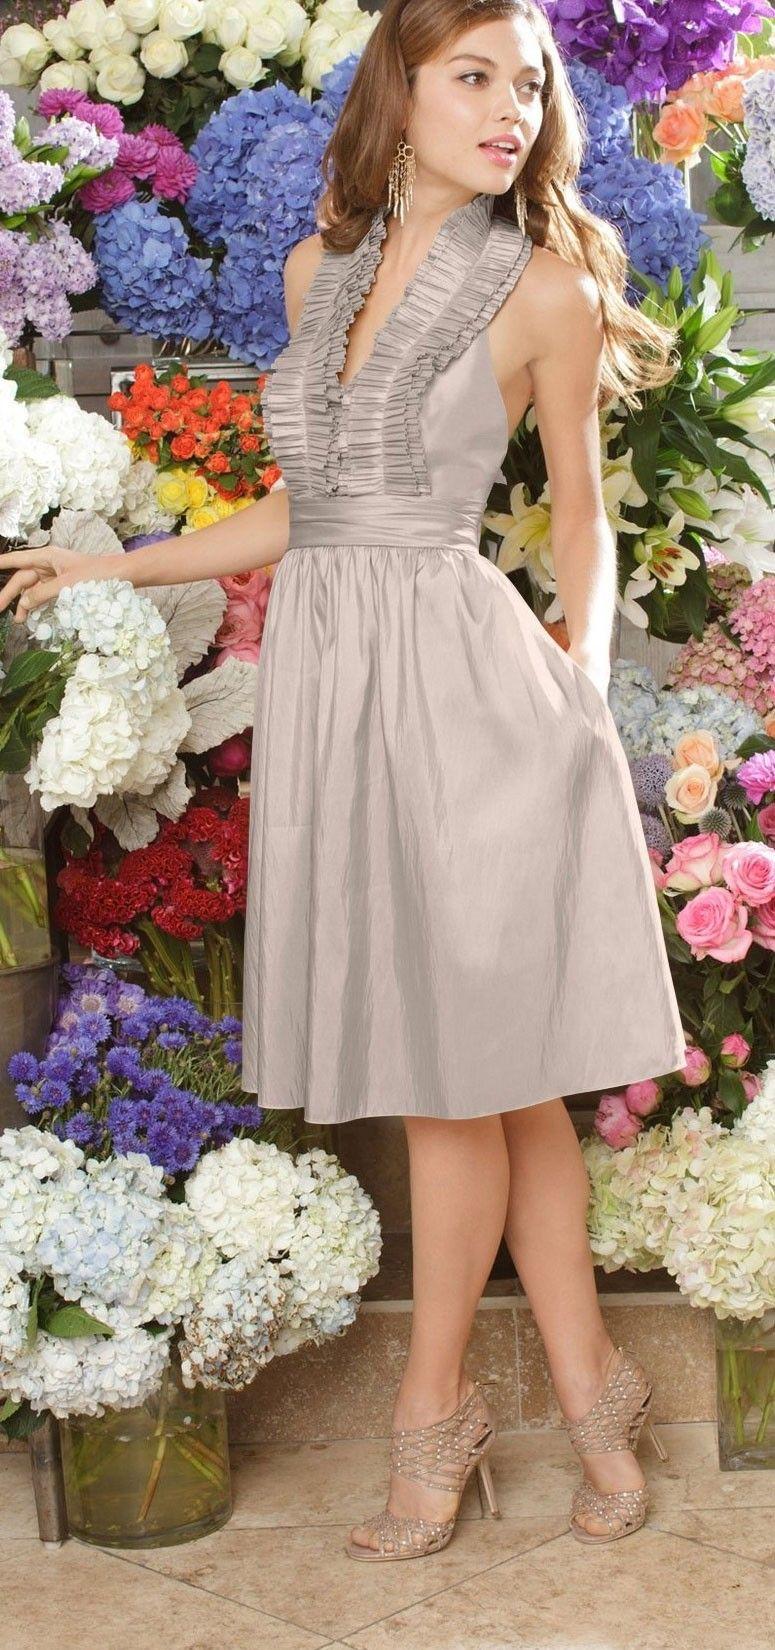 Ruffled collar fashion accents pinterest ruffle collar ruffled collar taffeta bridesmaid dressbridesmaid ombrellifo Gallery